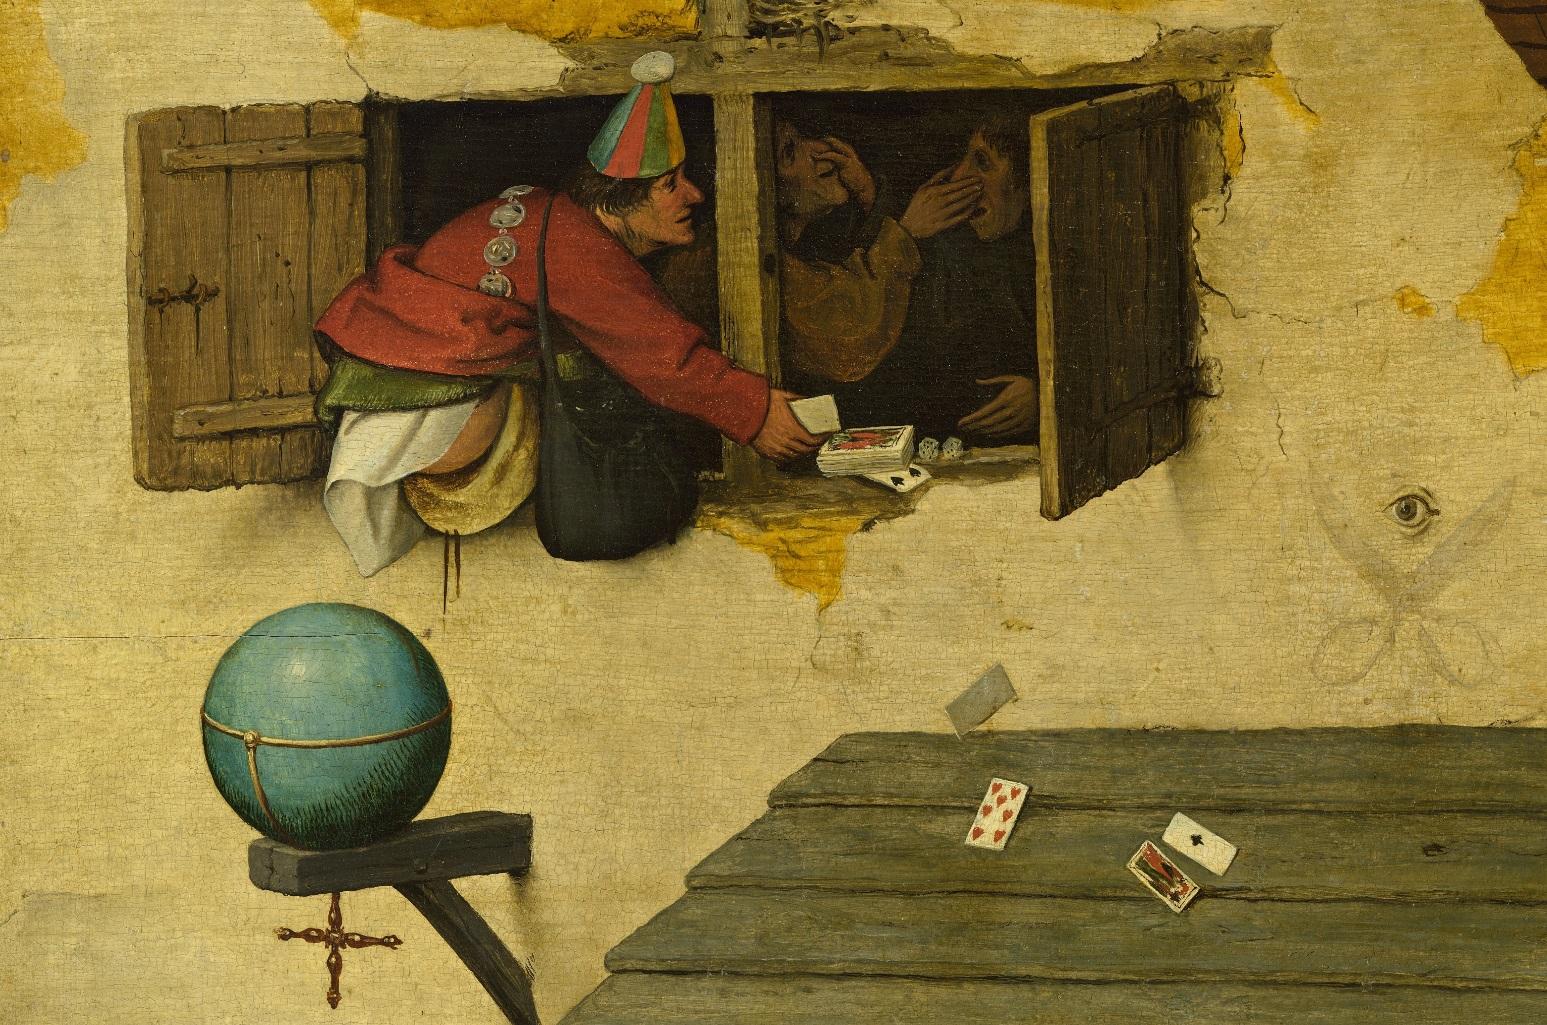 brueghel-proverbs-010.jpg